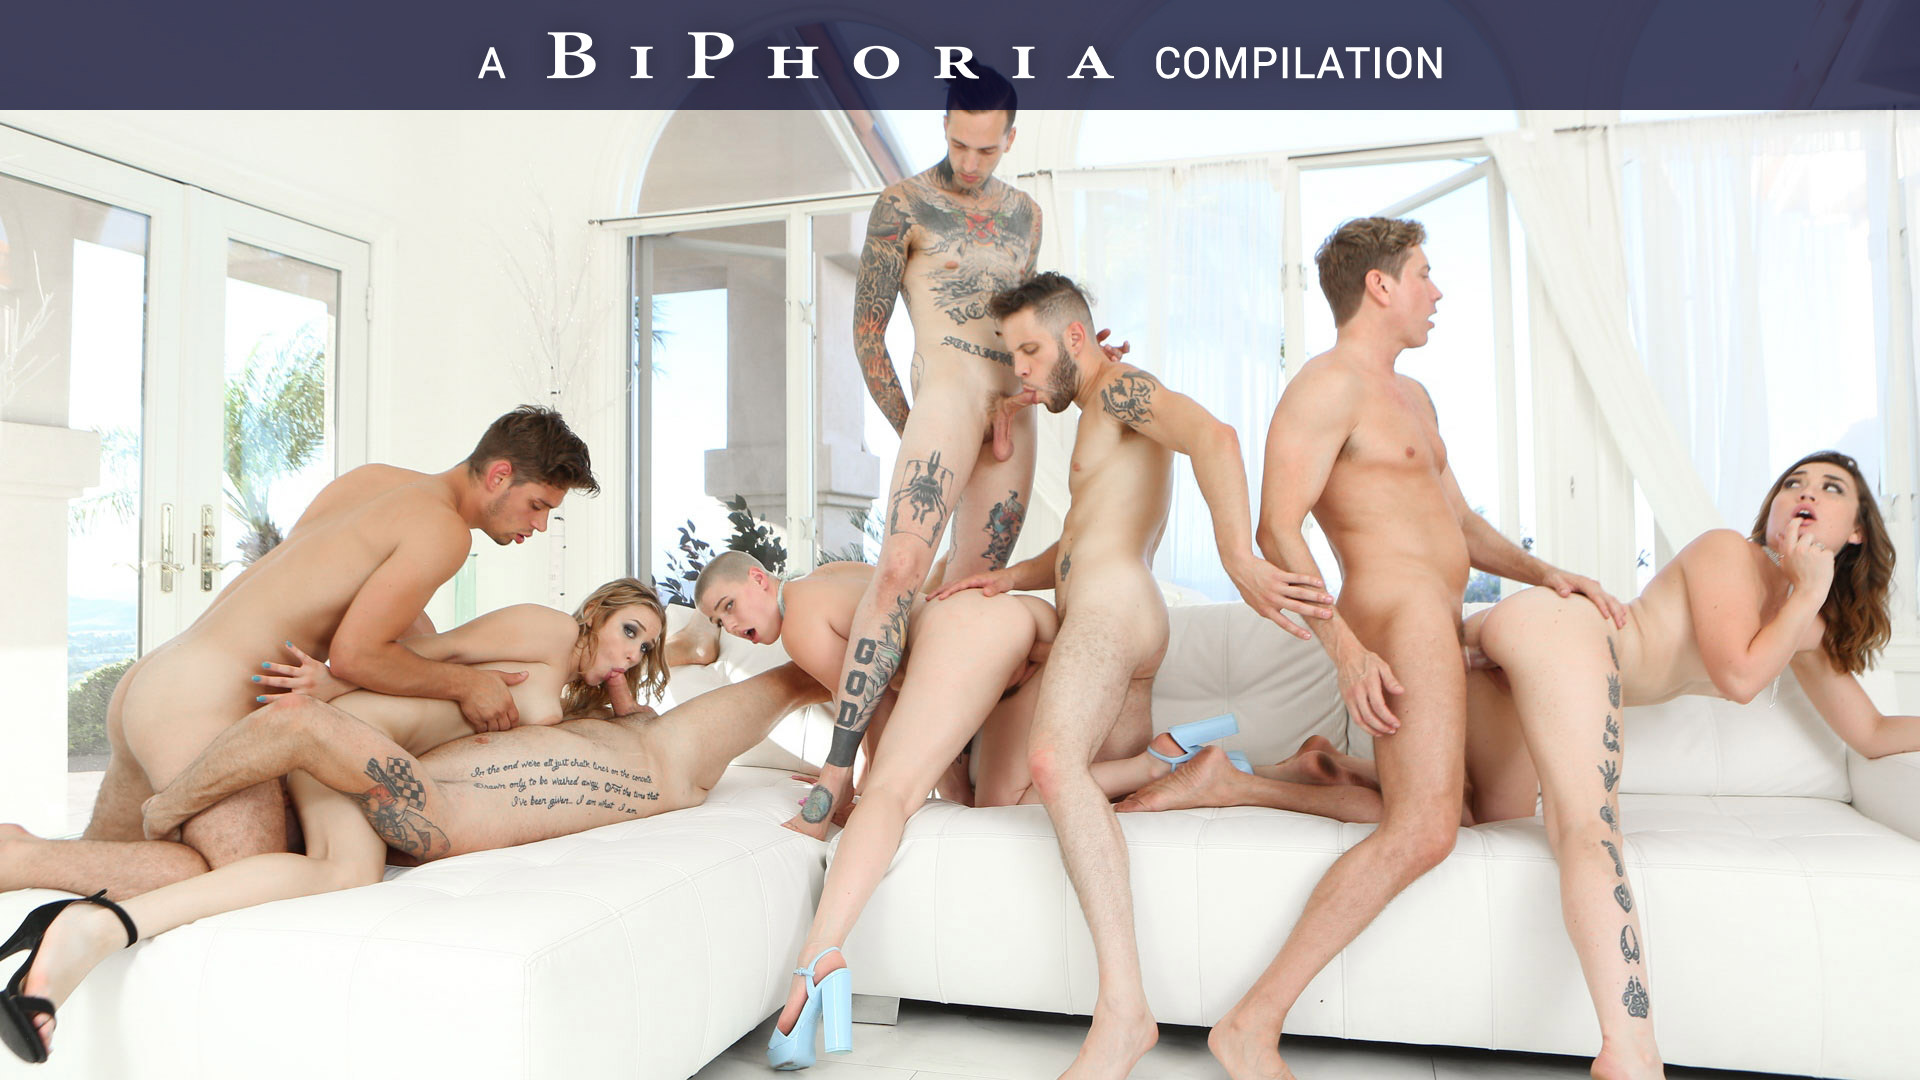 BiPhoria Top 10 Compilation, Scene #01